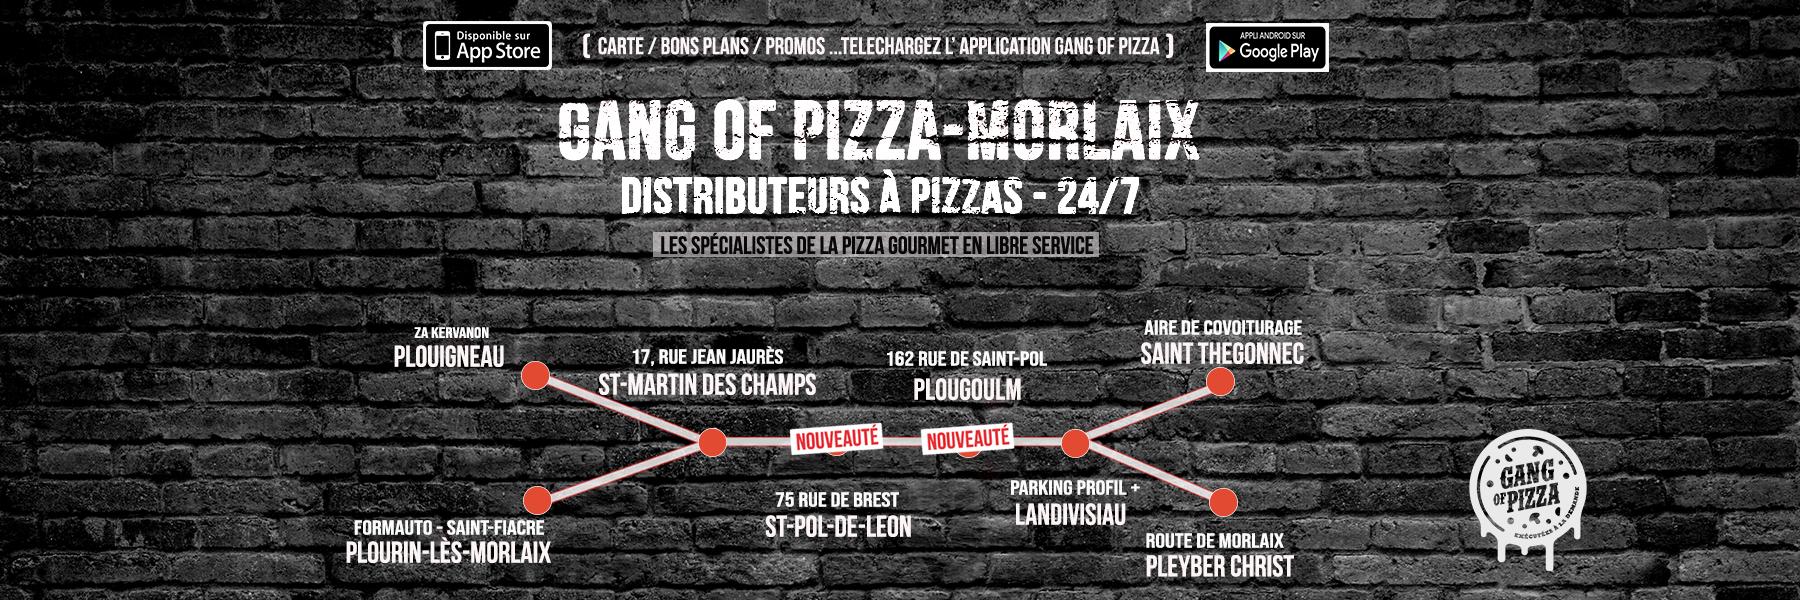 gang-of-pizza-debarque-a-st-pol-de-leon-plougoulm-morlaix-les-deux-rivieres-distributeurs-pizzas-24-7-gangofpizza